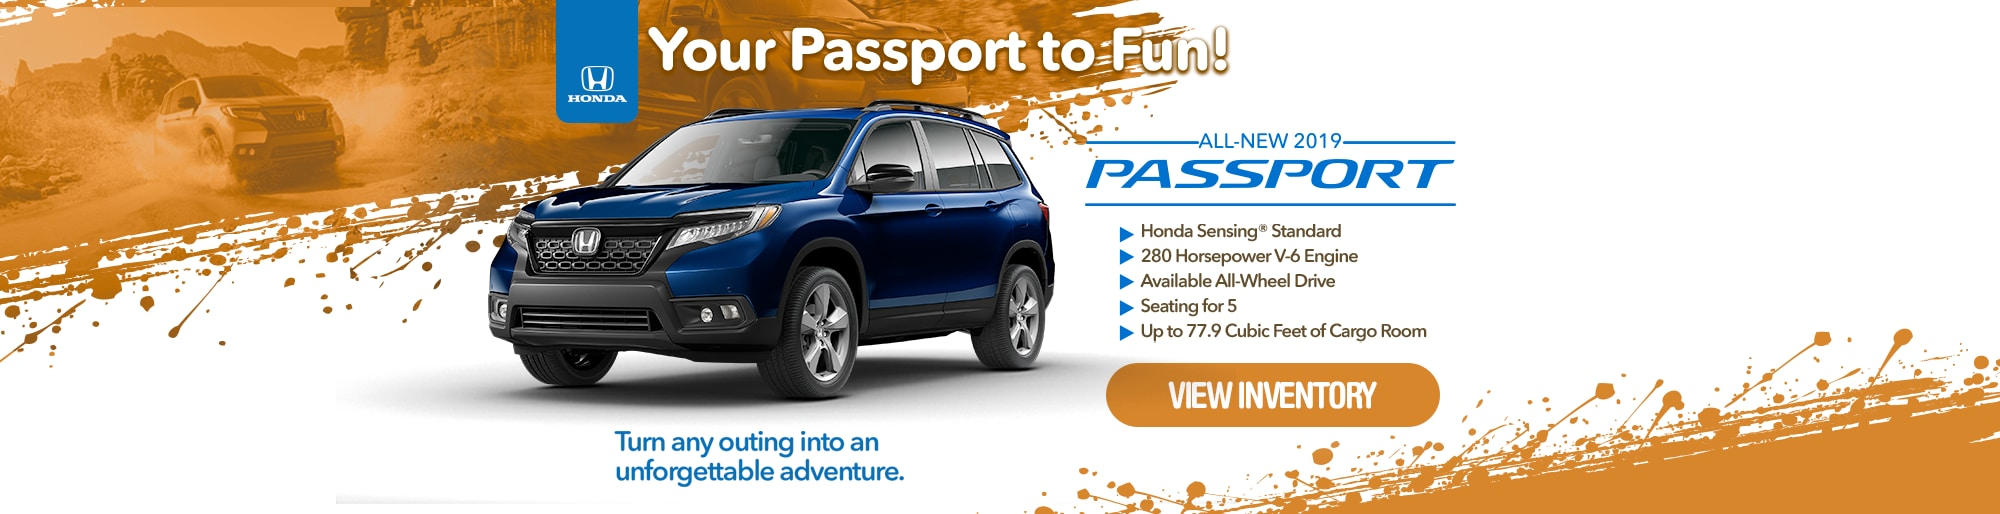 Lindsay Honda Used Cars >> New Used Honda Cars Trucks Suvs College Park Honda